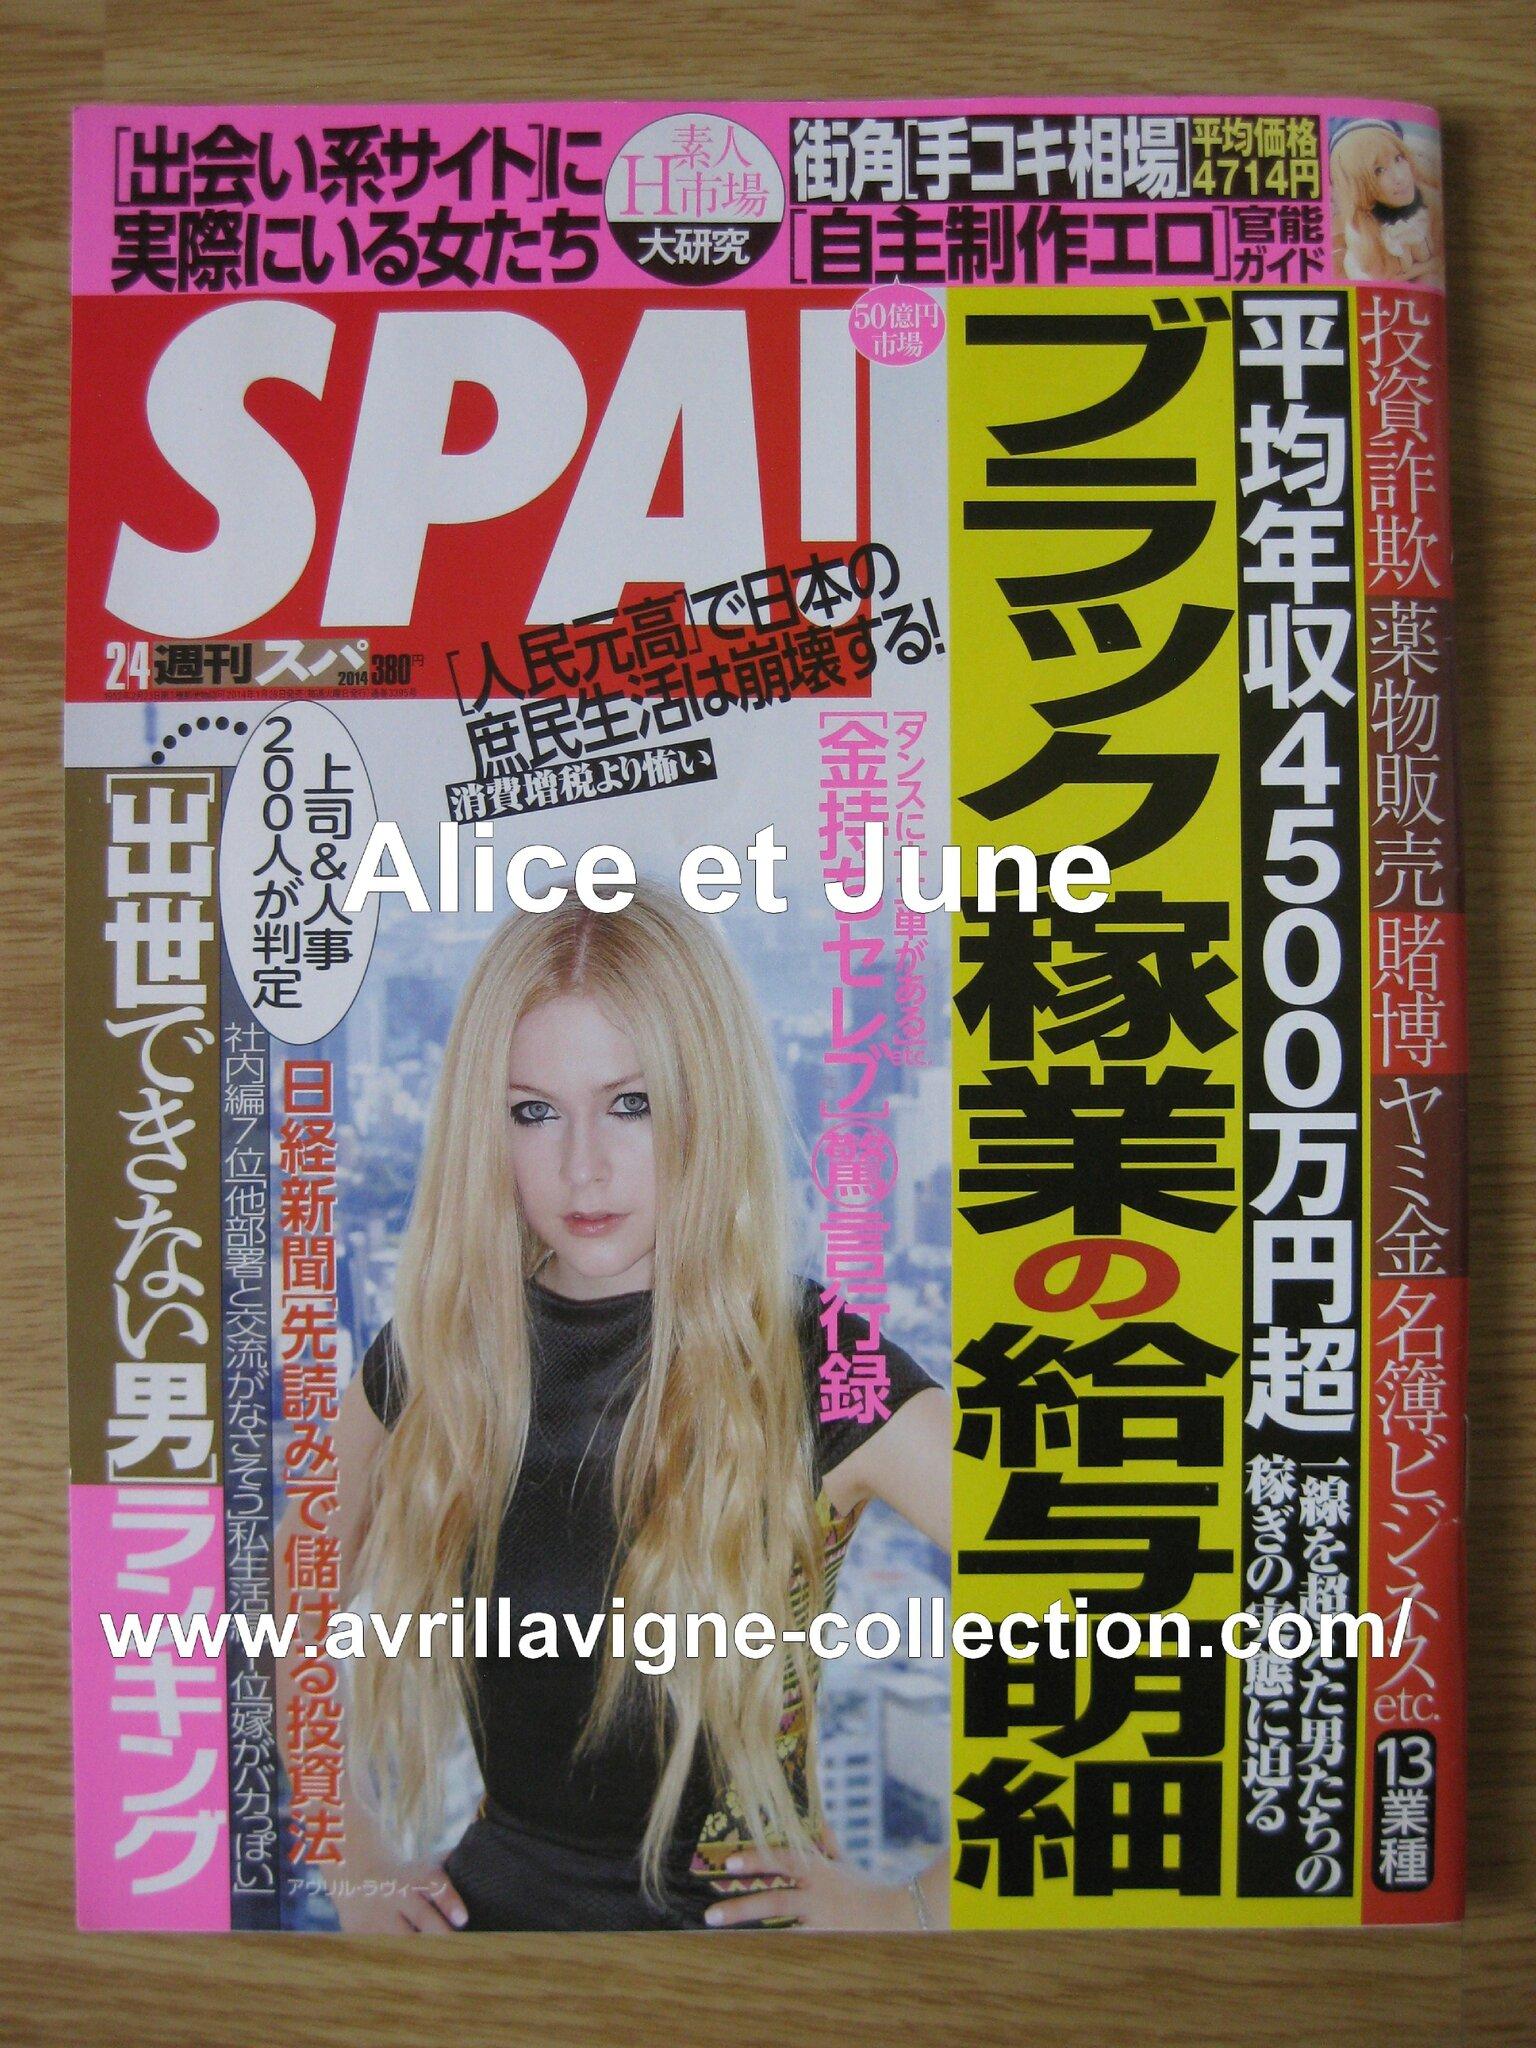 SPA! magazine-Japon (février 2014)